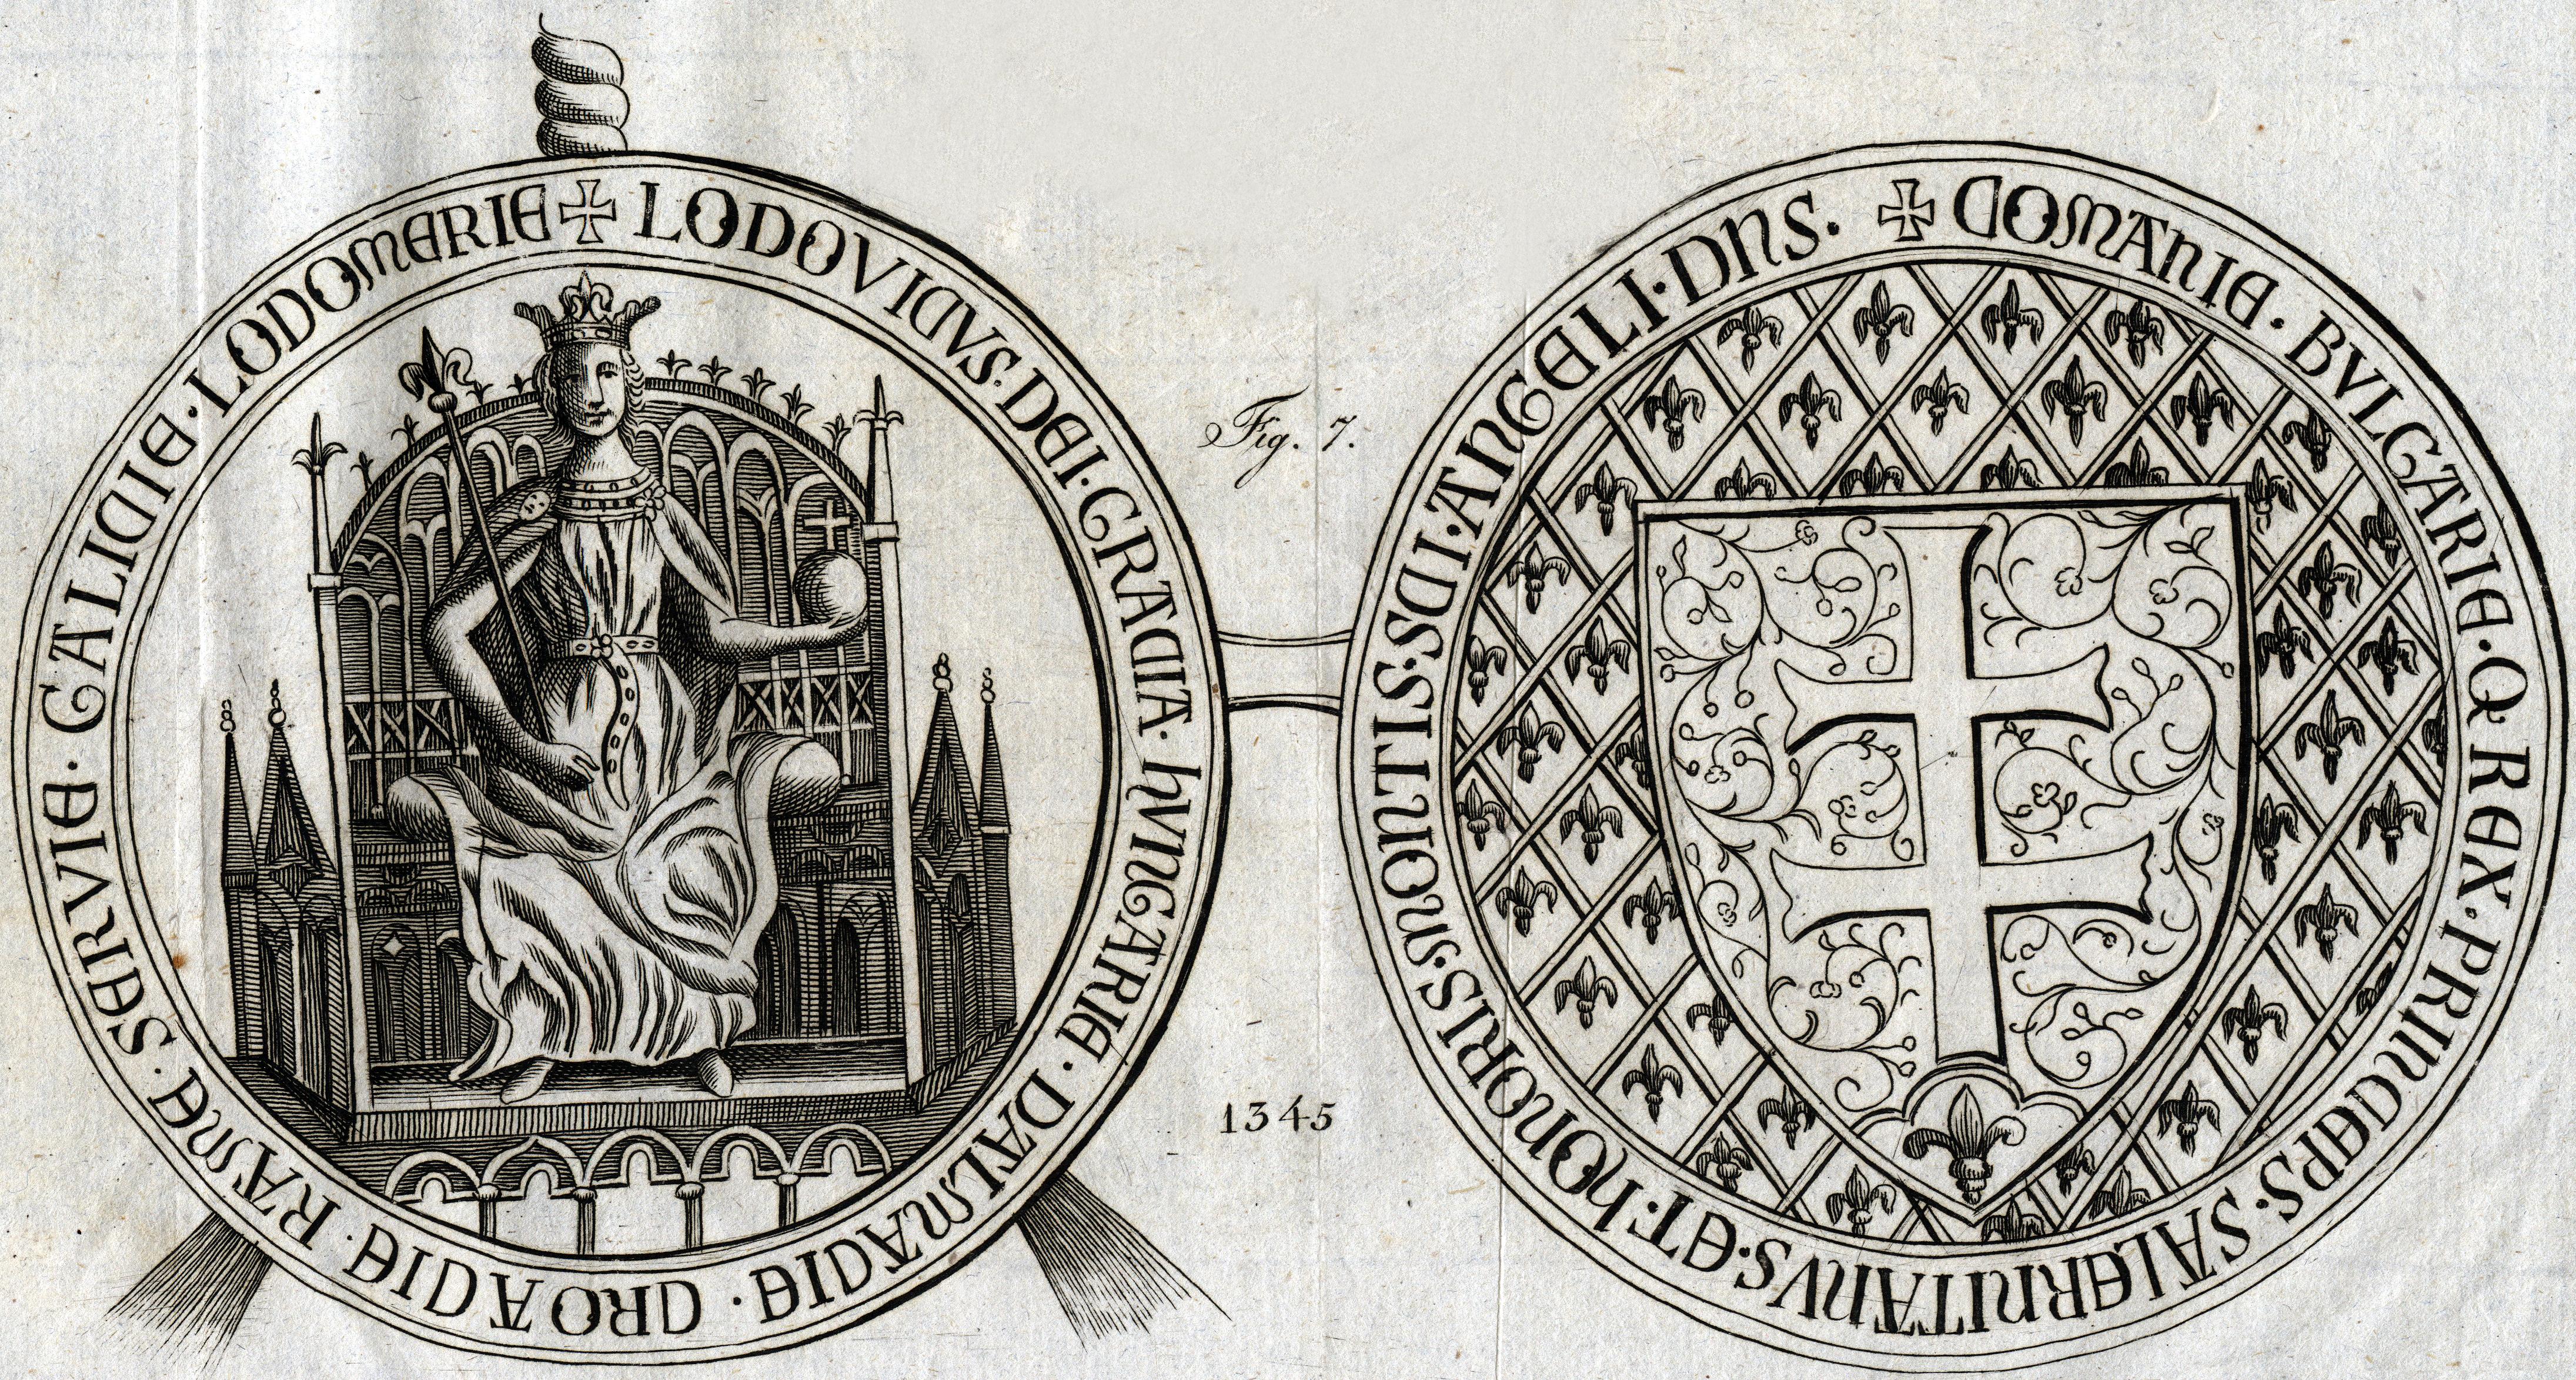 File:Sigillum Lodovici 1345.png